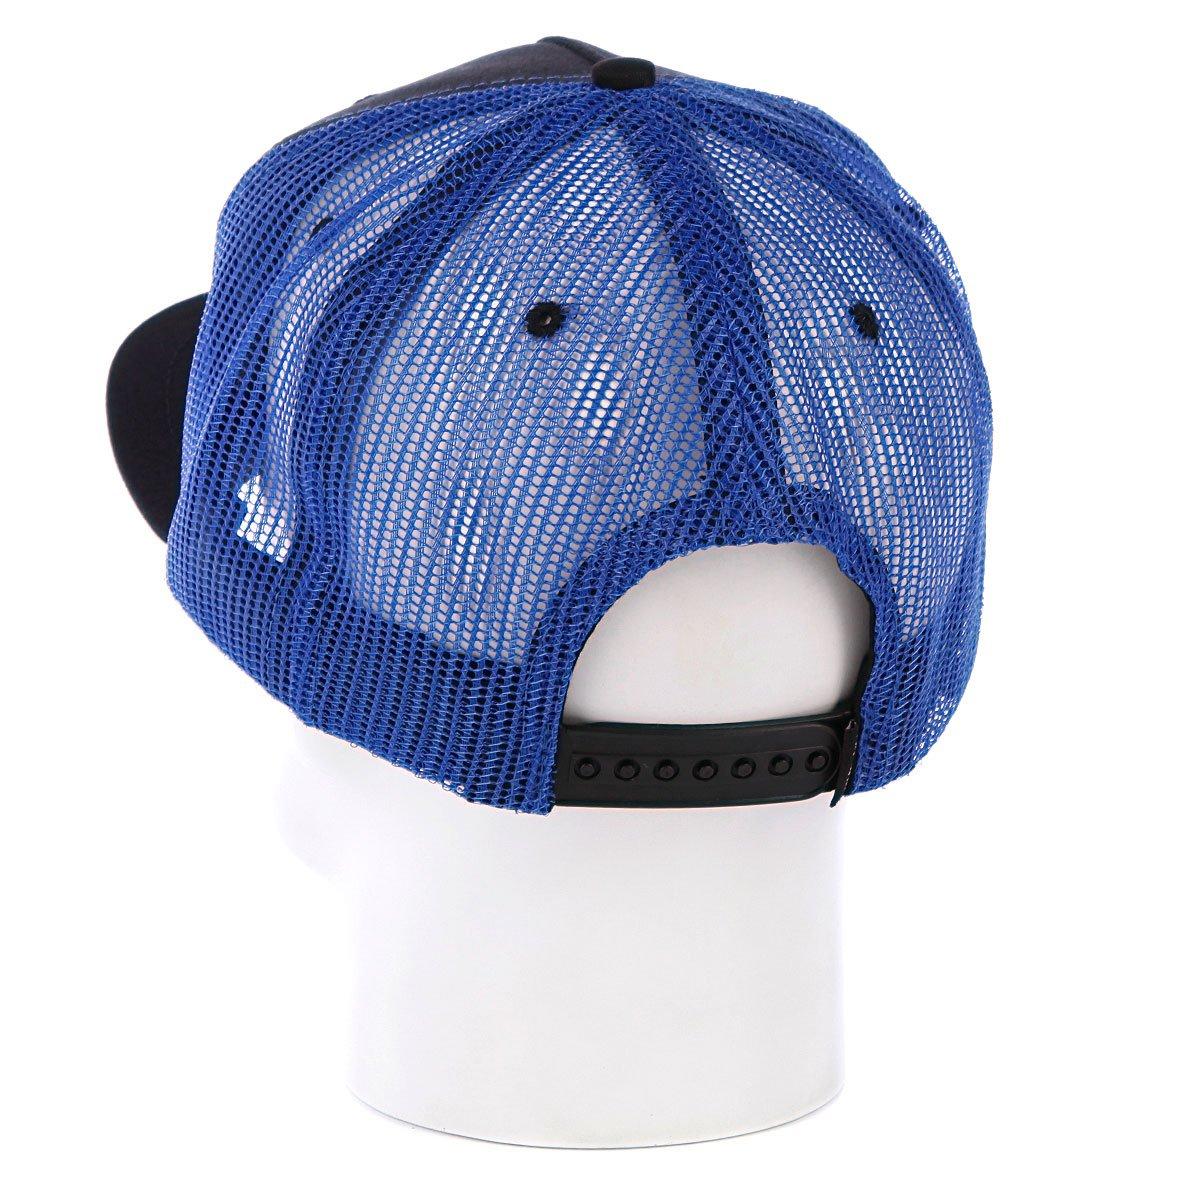 Купить бейсболку Toy Machine American Monster Mesh Blue в интернет ... 836f6ac02219